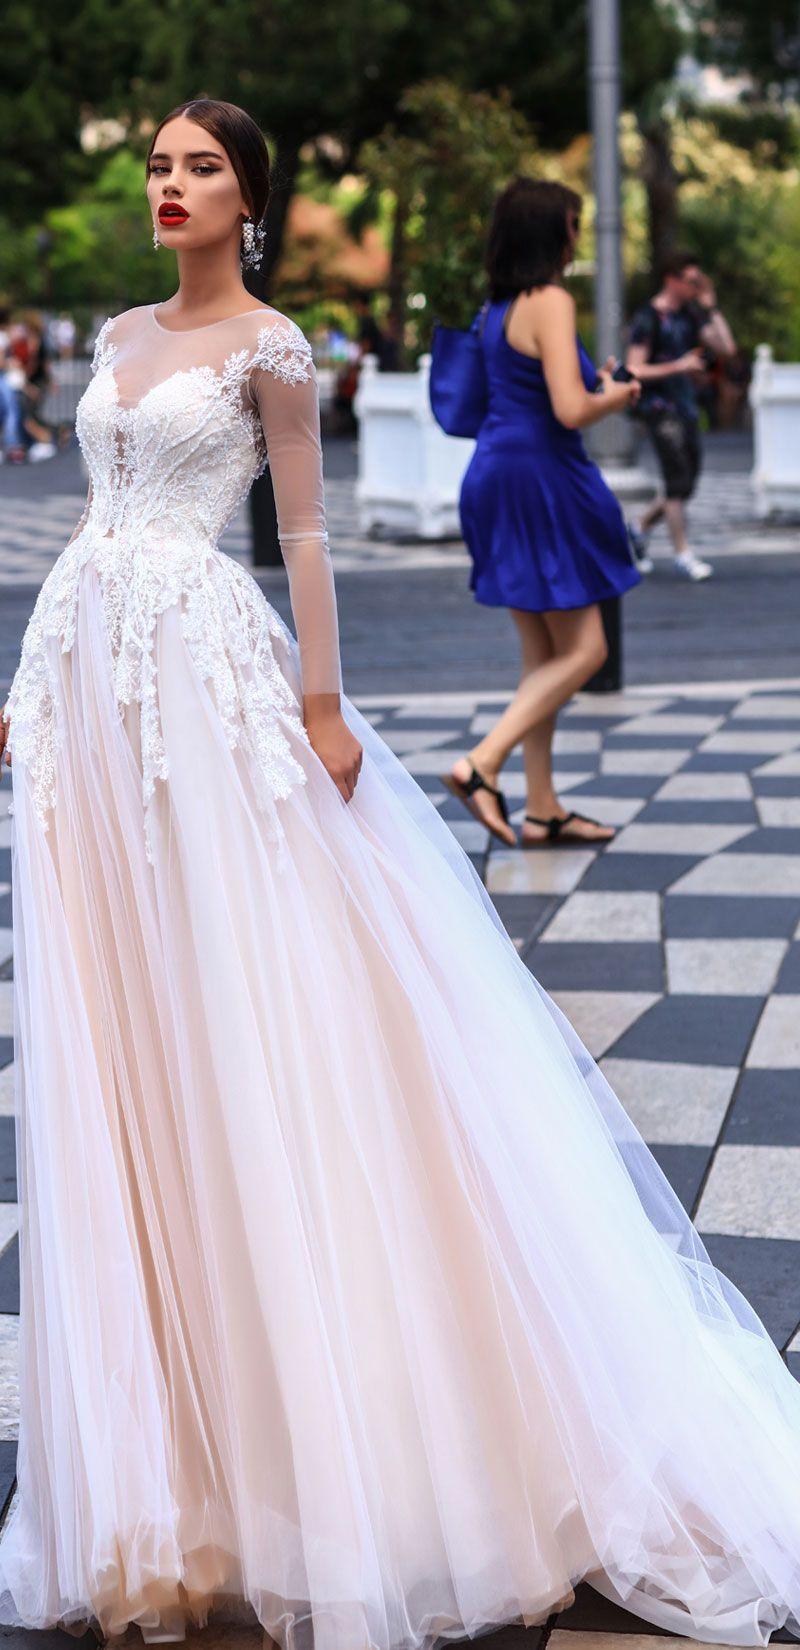 Katherine joyce wedding dresses ucma cherieud bridal collection